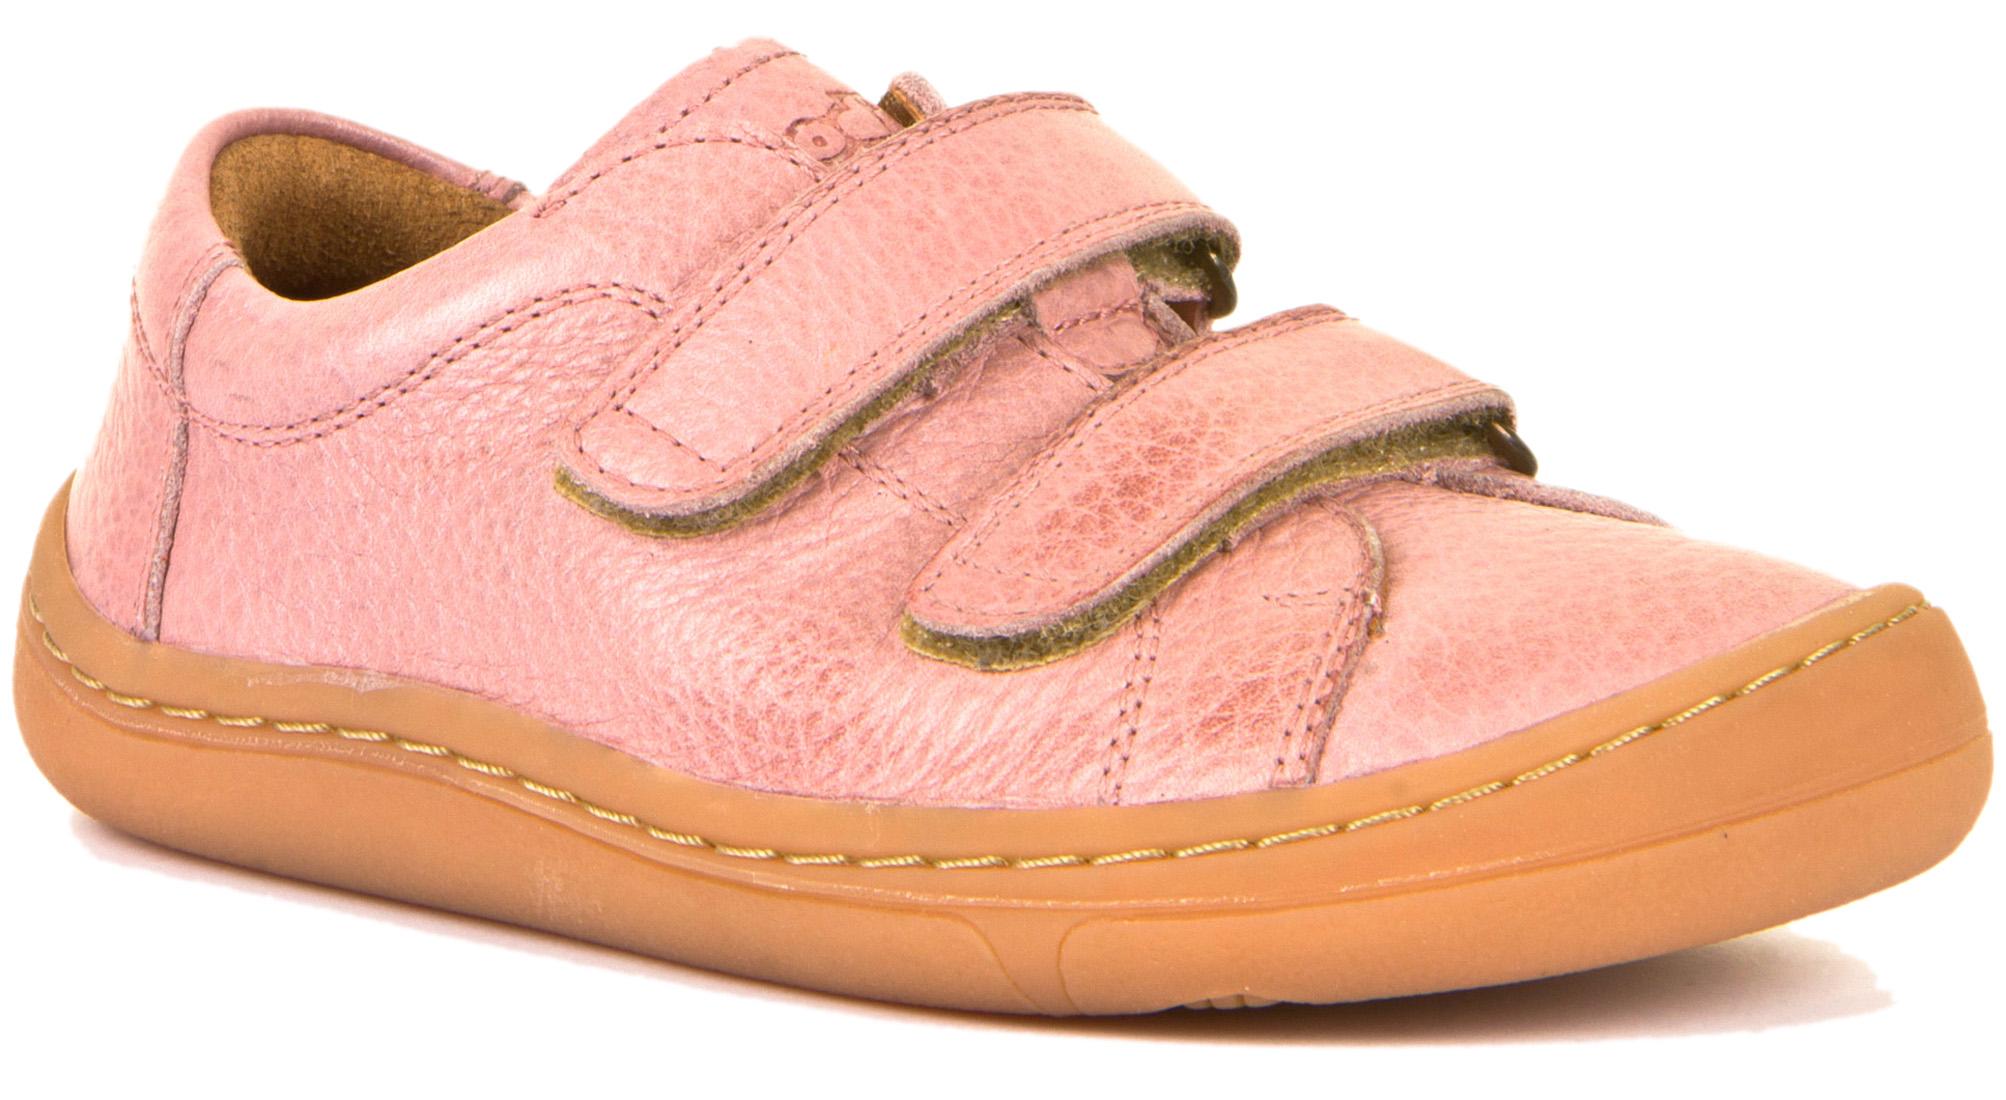 Froddo Barfuß Kinderschuh Doppelklett Pink